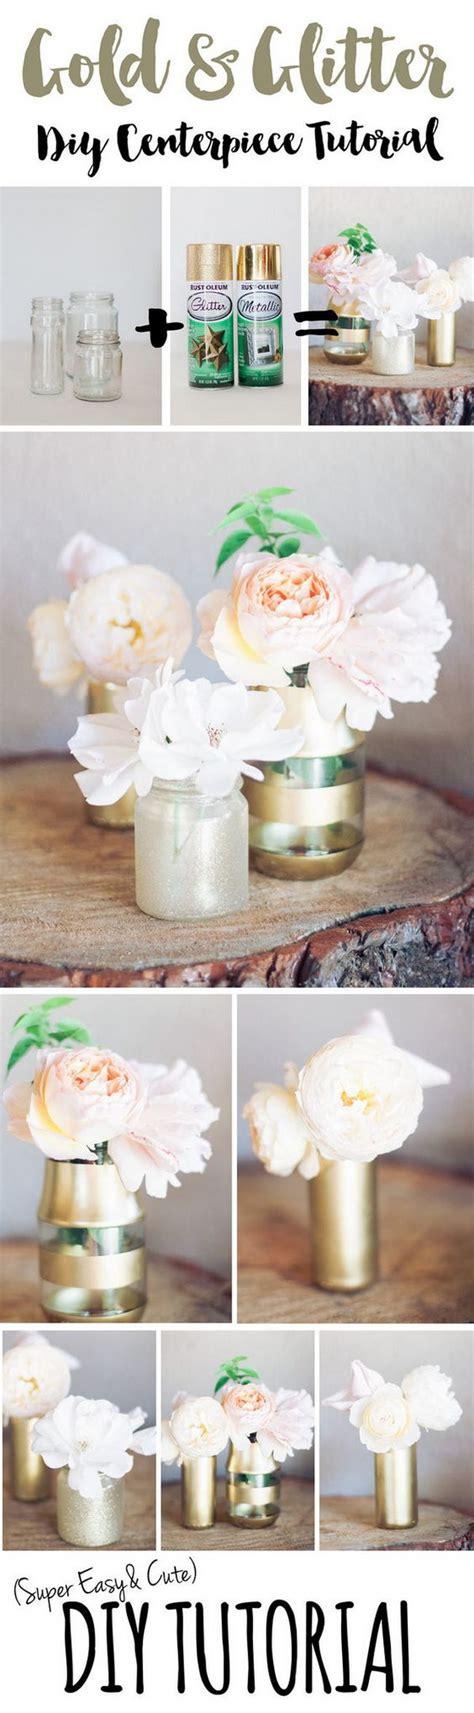 Handmade Wedding Centerpiece Ideas - awesome diy wedding centerpiece ideas tutorials